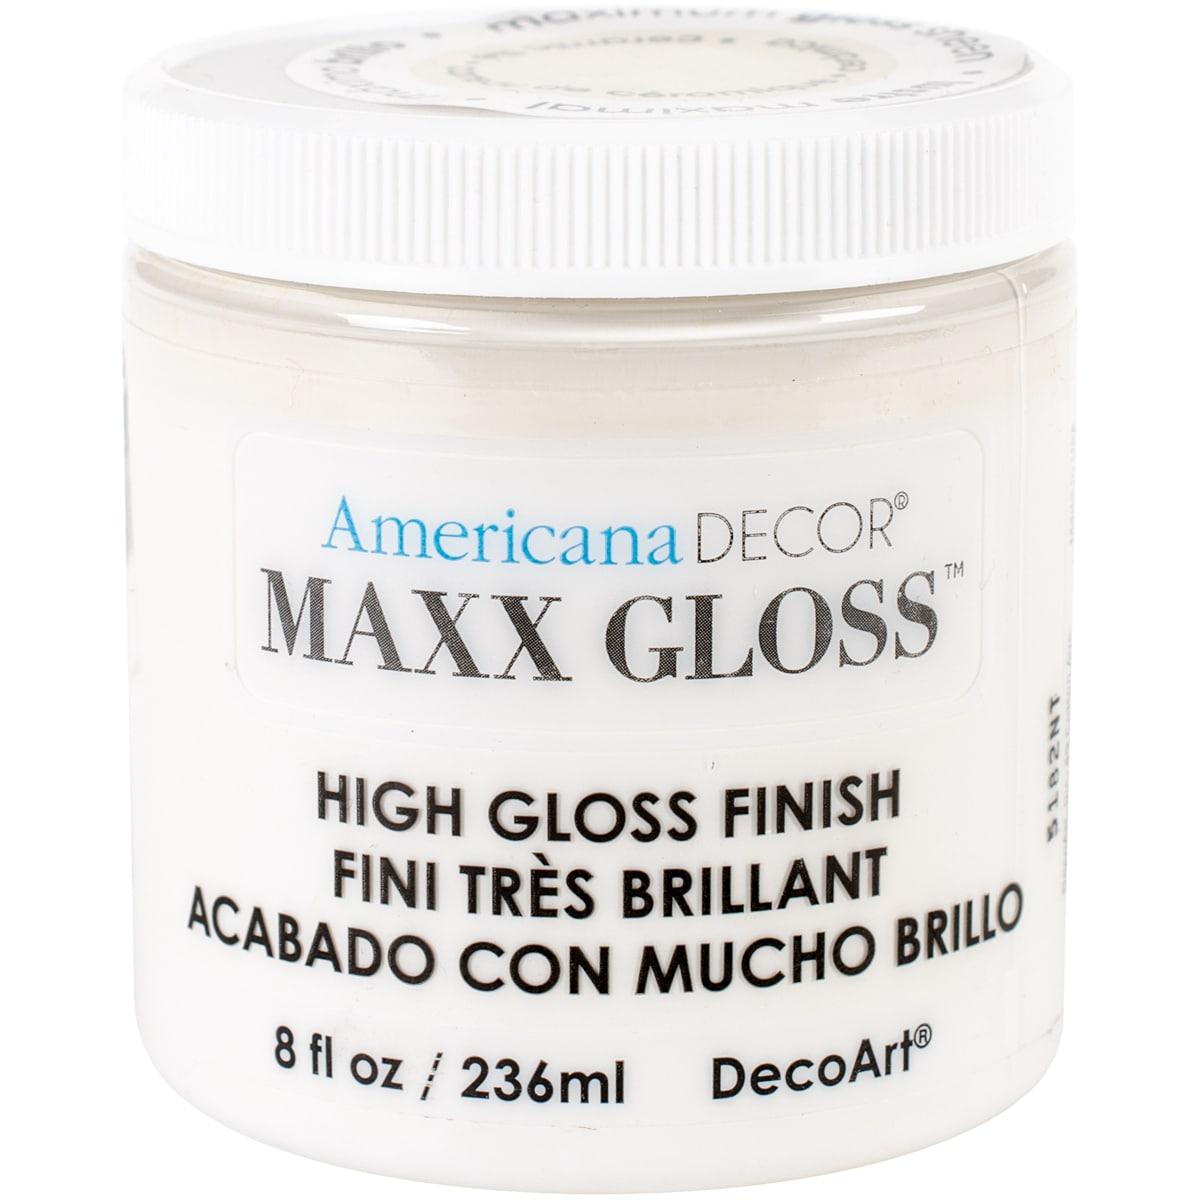 Decoart Americana Maxx Gloss 8oz Ceramic Tile (Decorative...